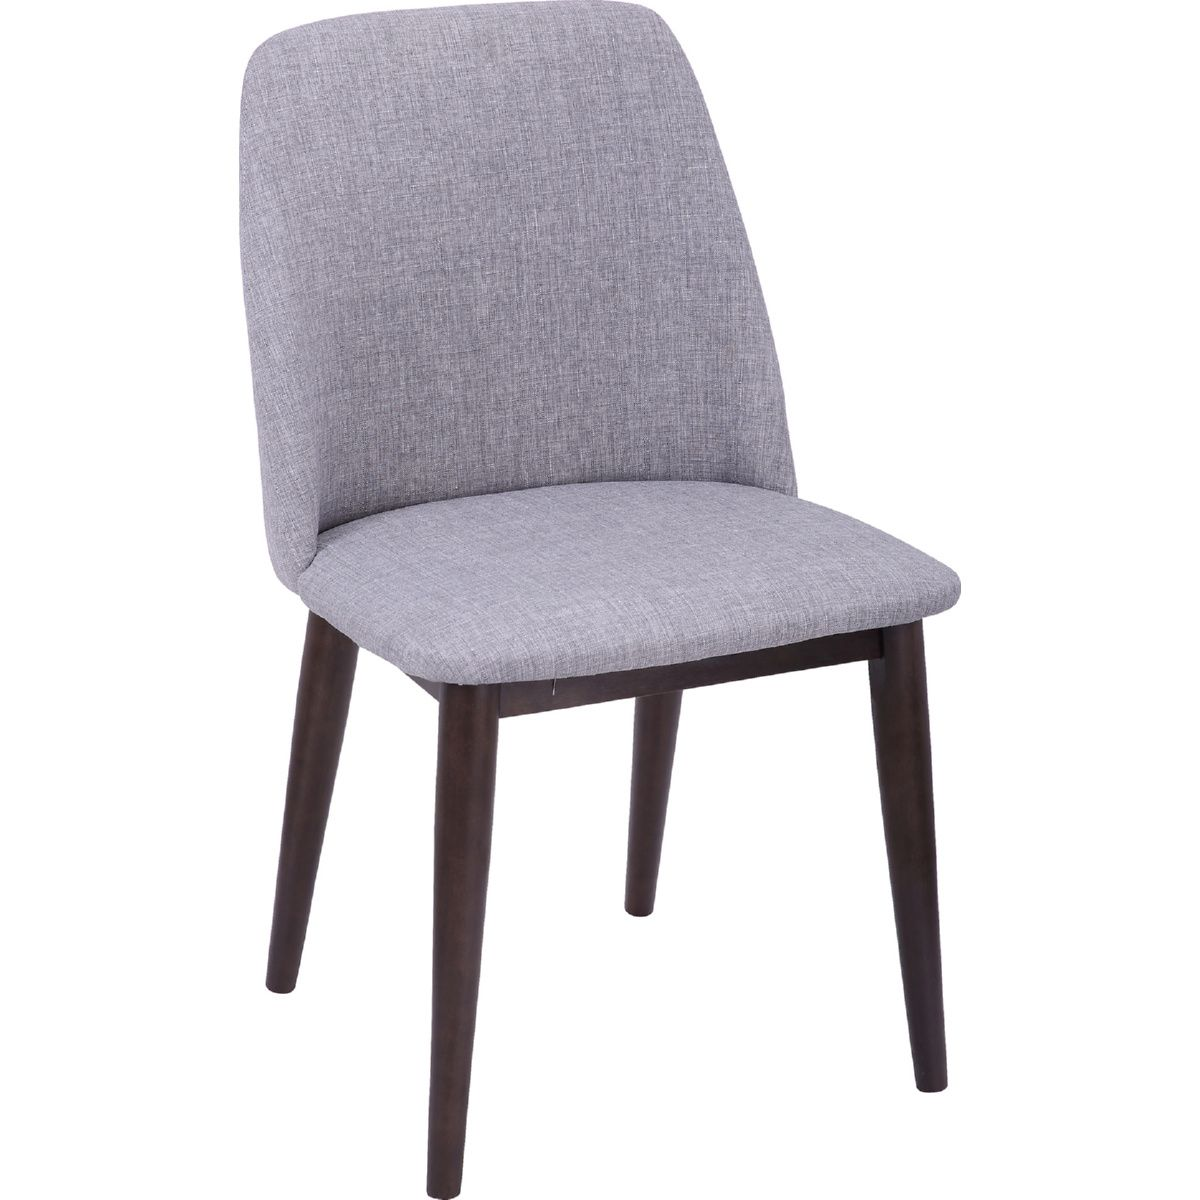 Lumisource Chr Tnt Wl Lgy2 Tintori Dining Chair Light Grey Fabric